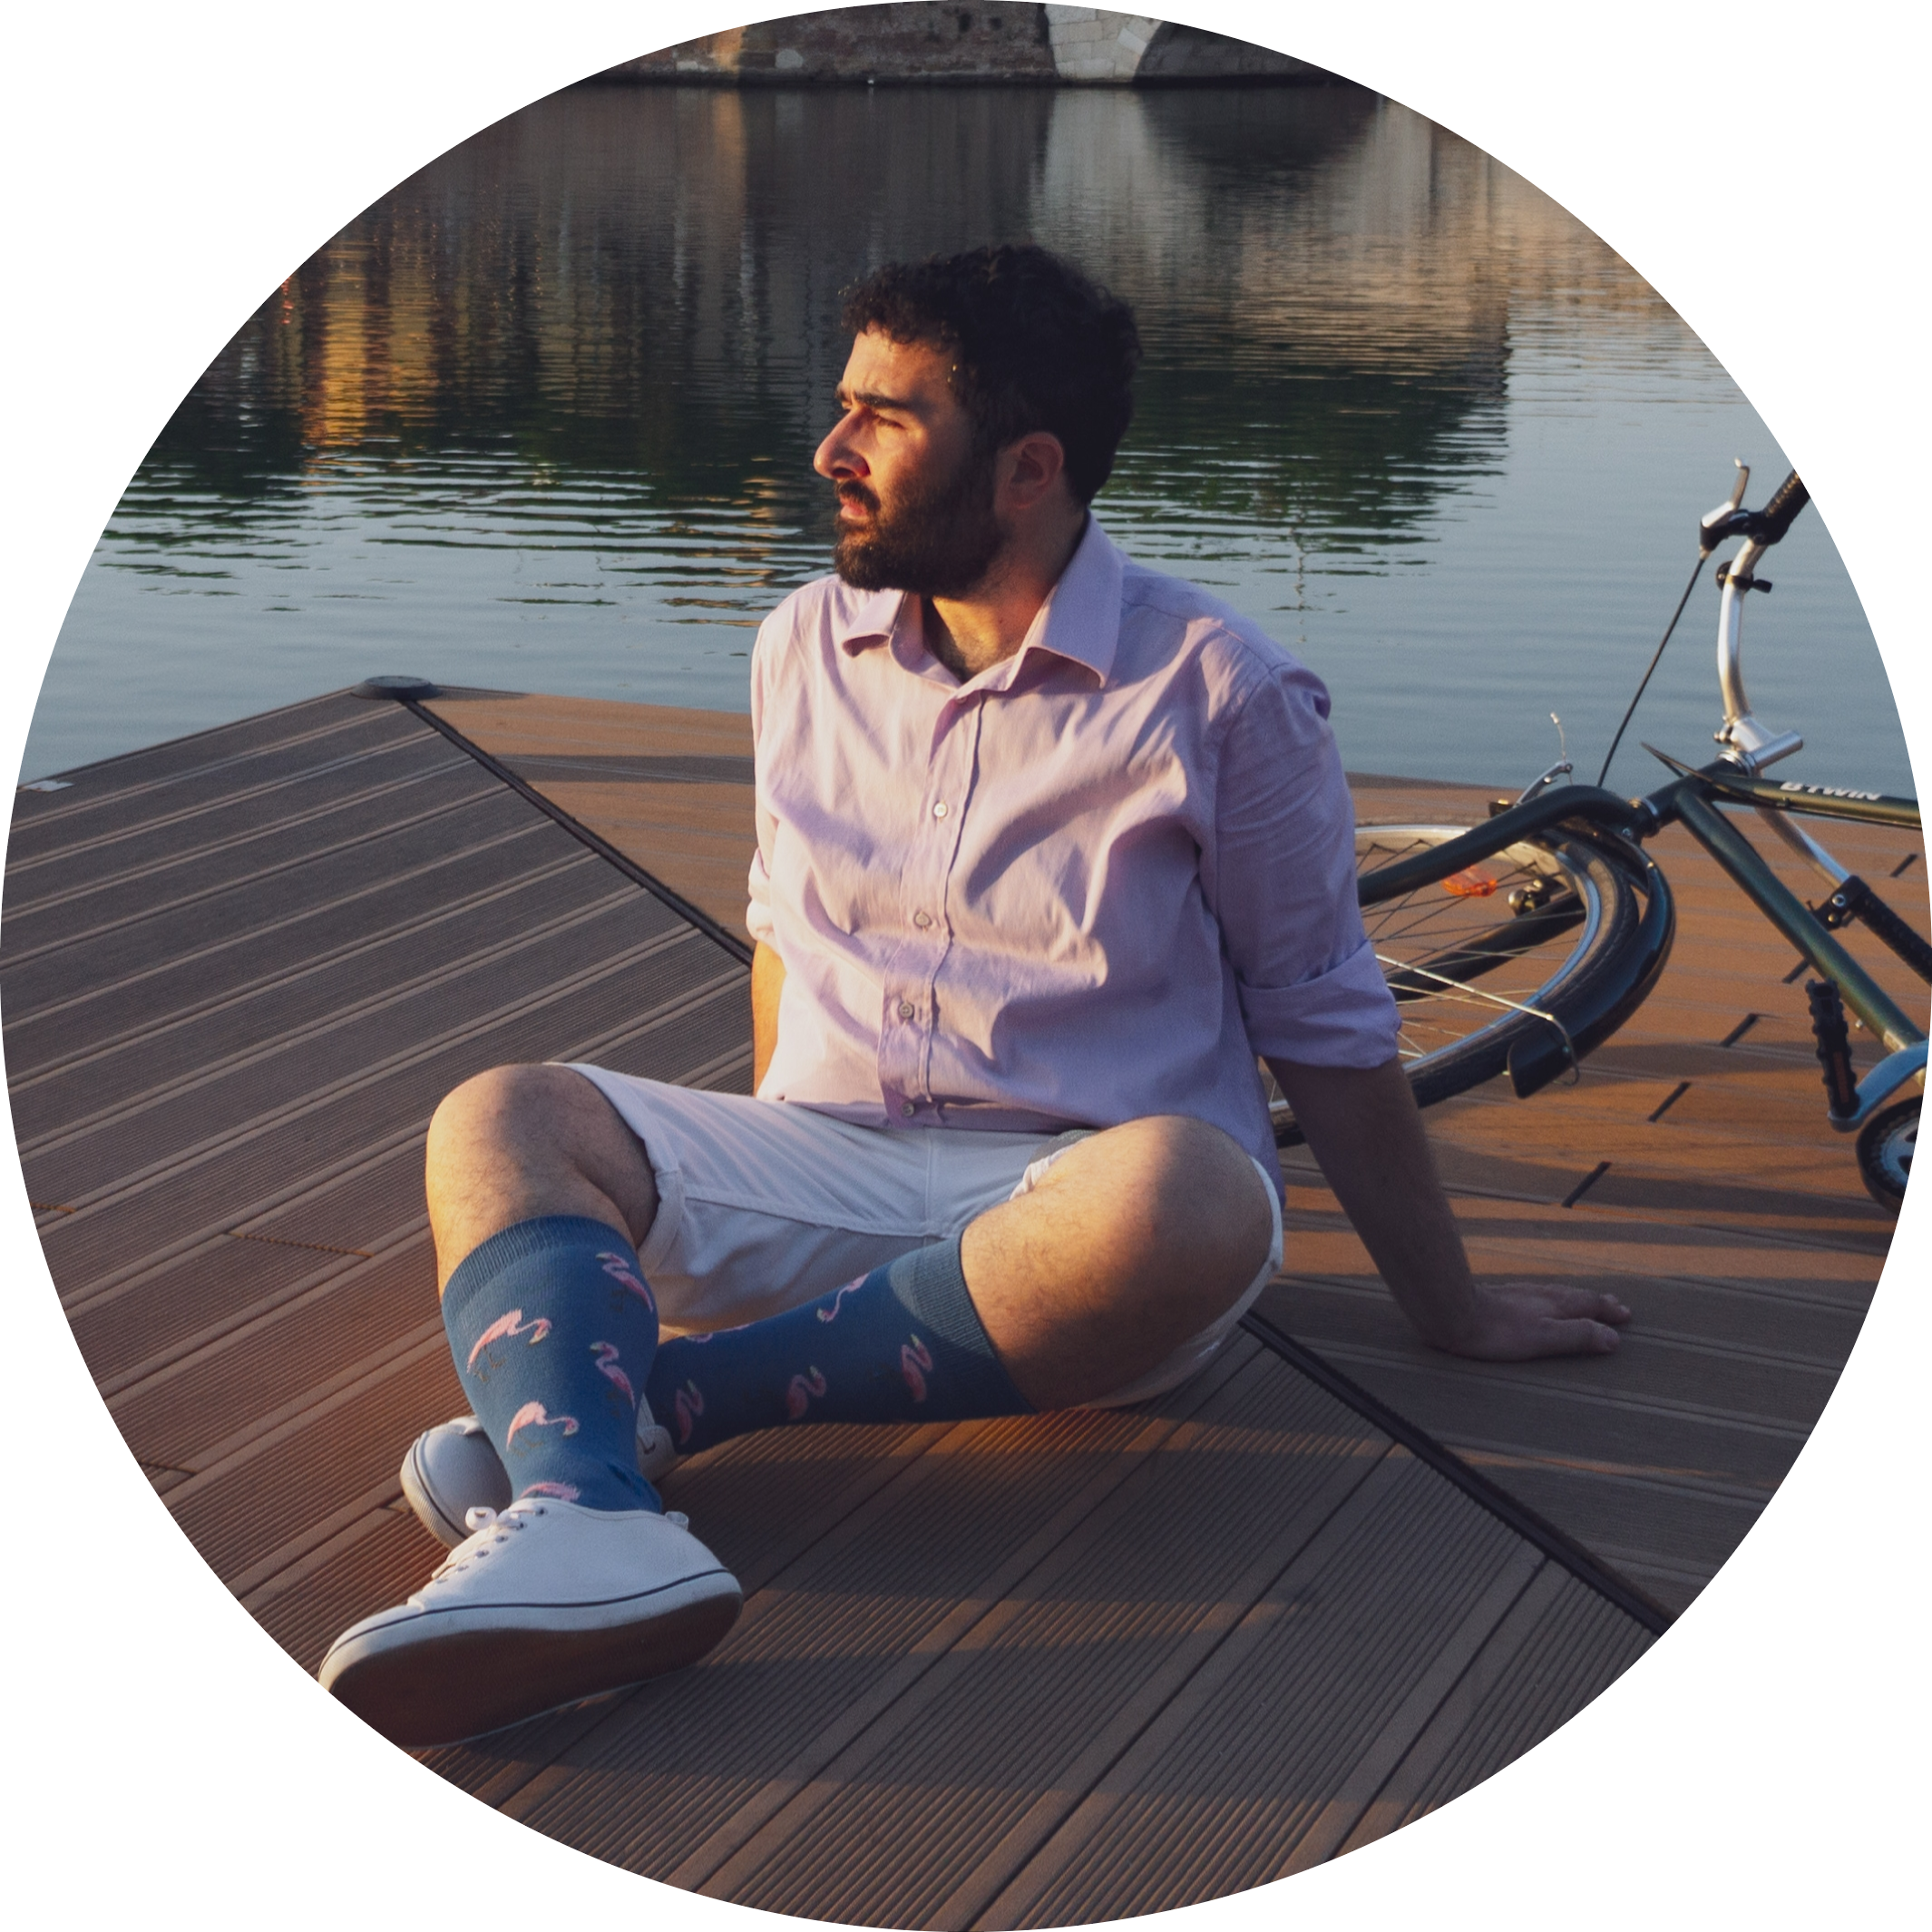 @ruggero_falone Profile Image | Linktree